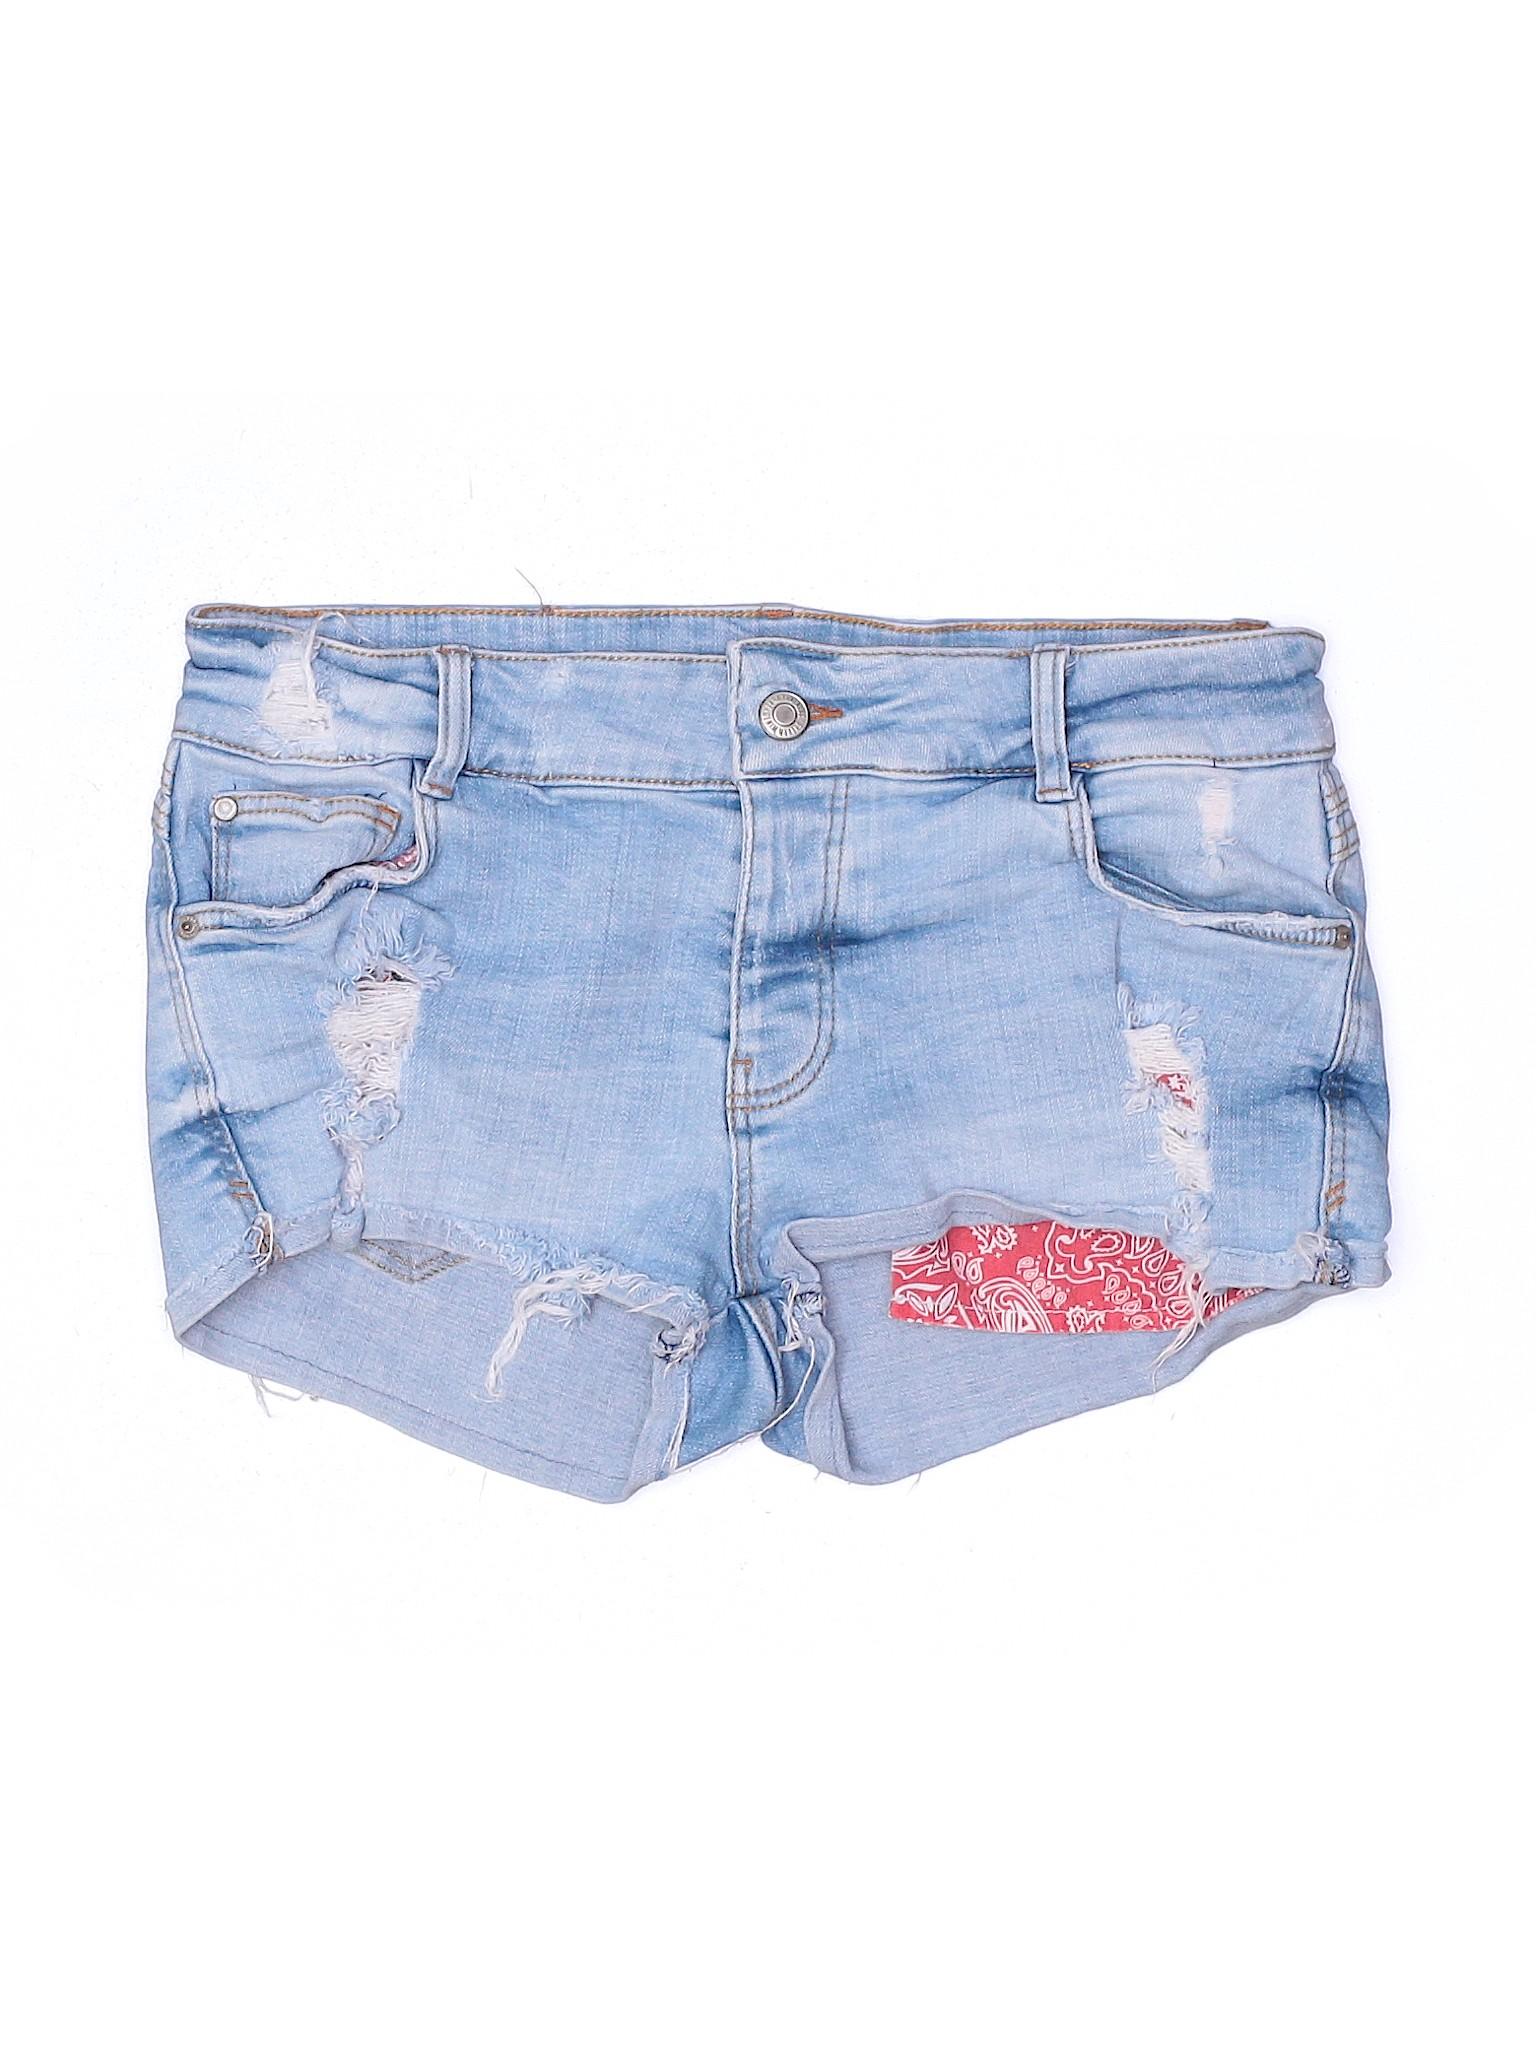 New Zara trafaluc premium quality denim shorts 8